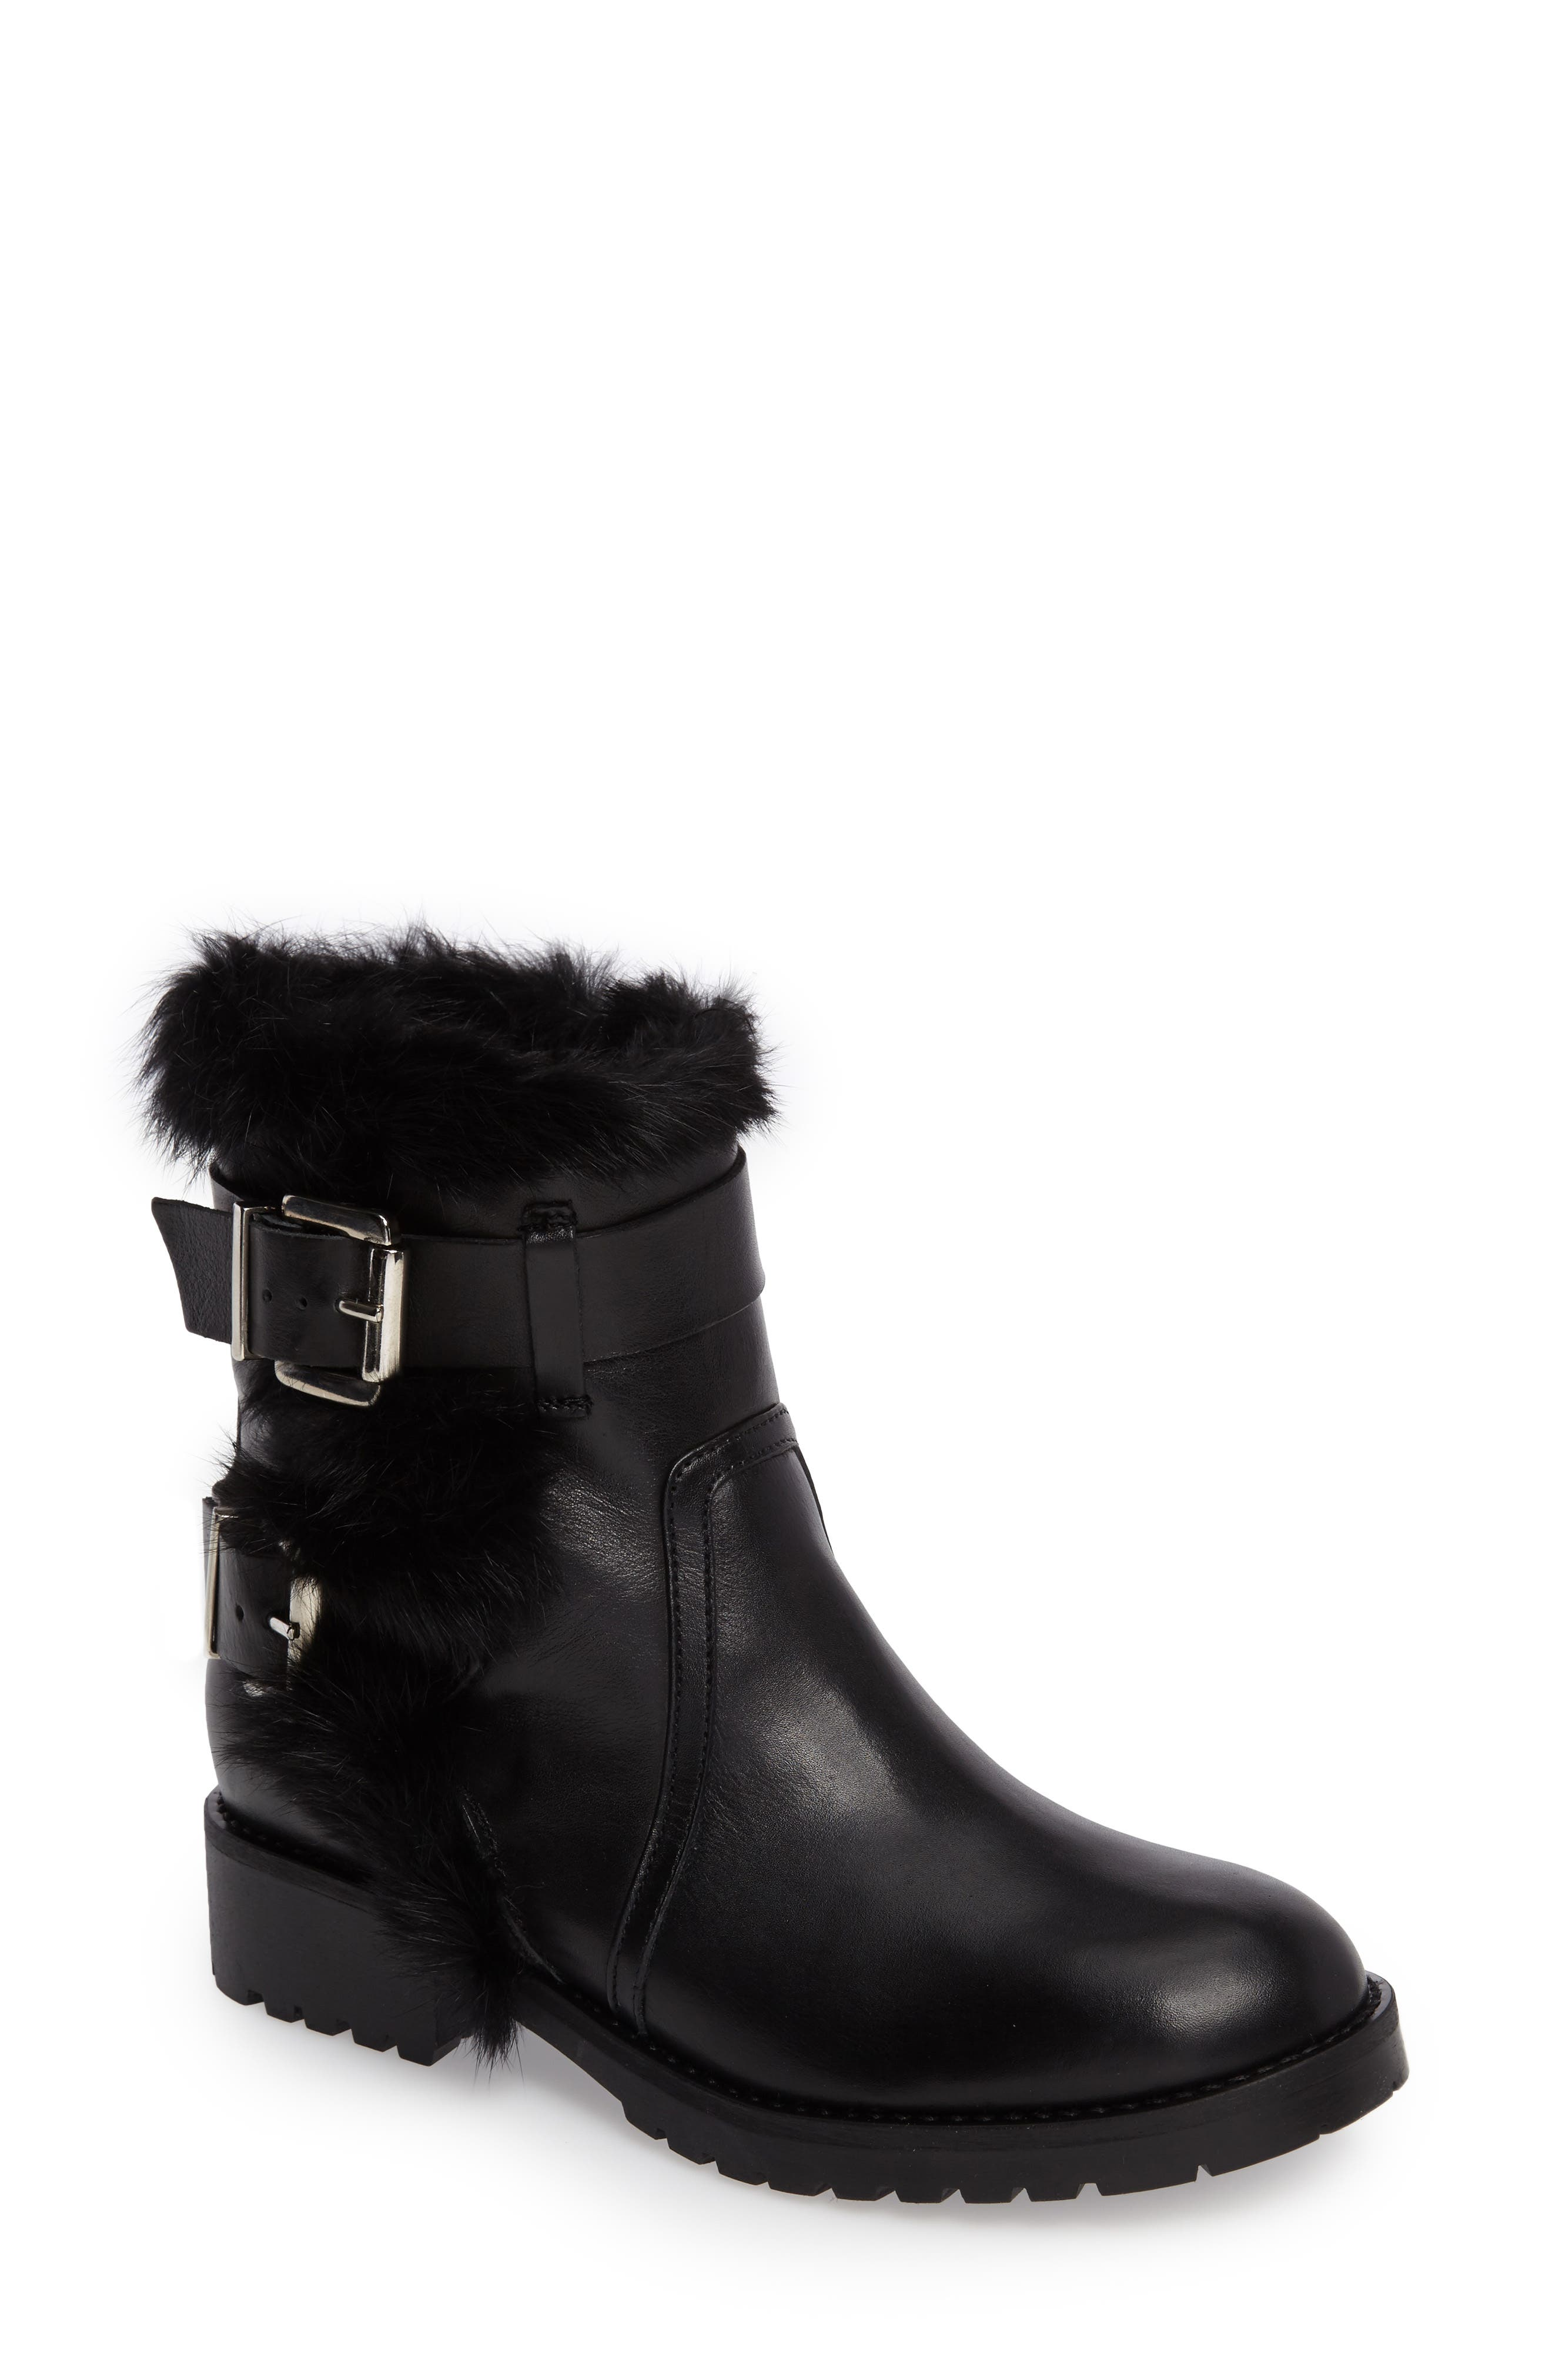 Charles David Rustic Genuine Rabbit Fur Cuff Boot (Women)